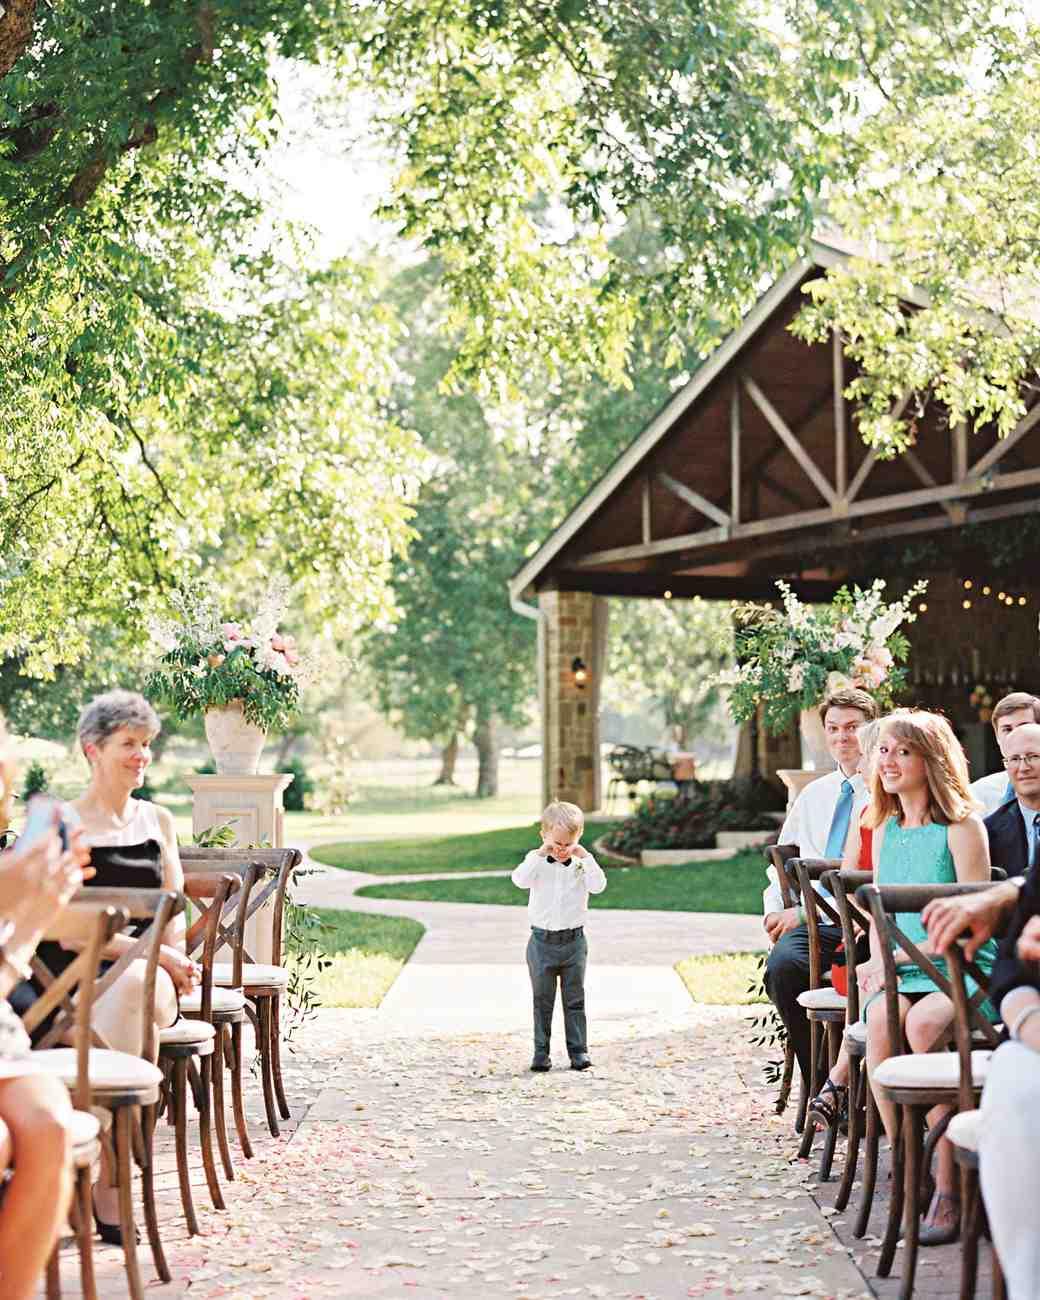 david-tyler-real-wedding-ring-bearer-walking-down-aisle.jpg